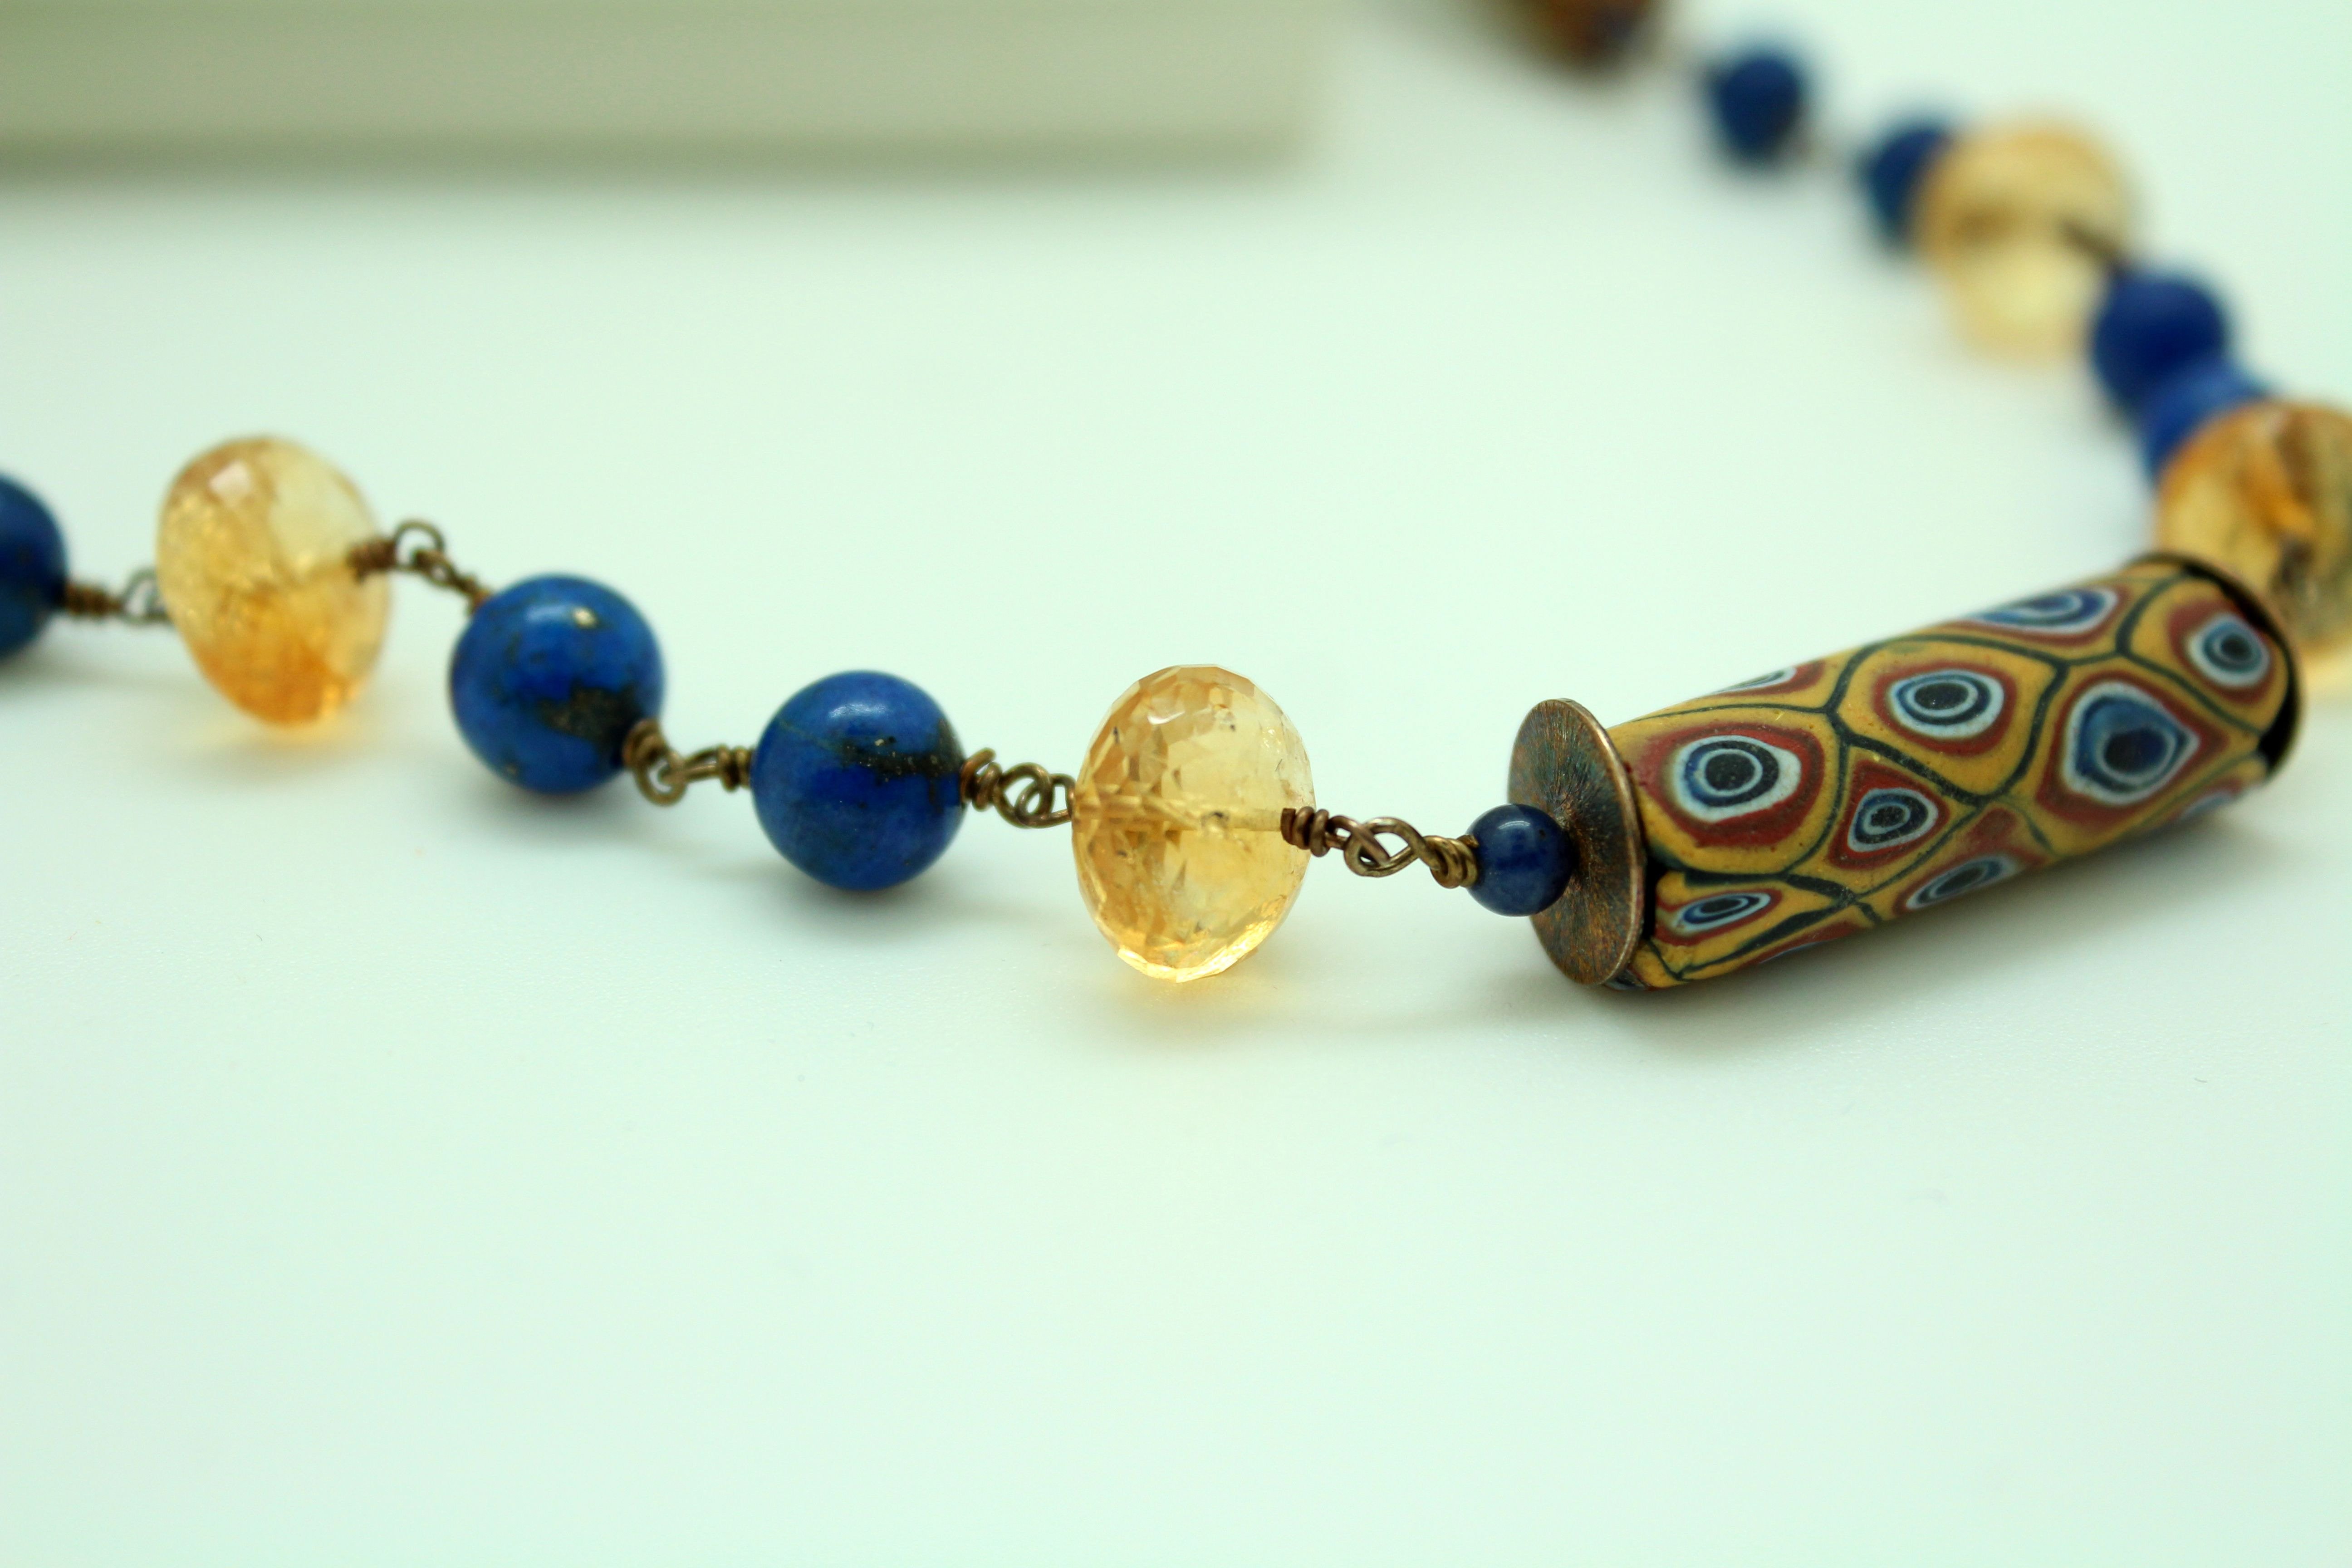 Murrinas - necklace - old murrinas - Venice murrinas - collier - short necklace - lapis lazuli necklace - glass necklace - quartz citrine https://www.etsy.com/listing/257735526/murrinas-necklace-old-murrinas-venice?ref=shop_home_active_11